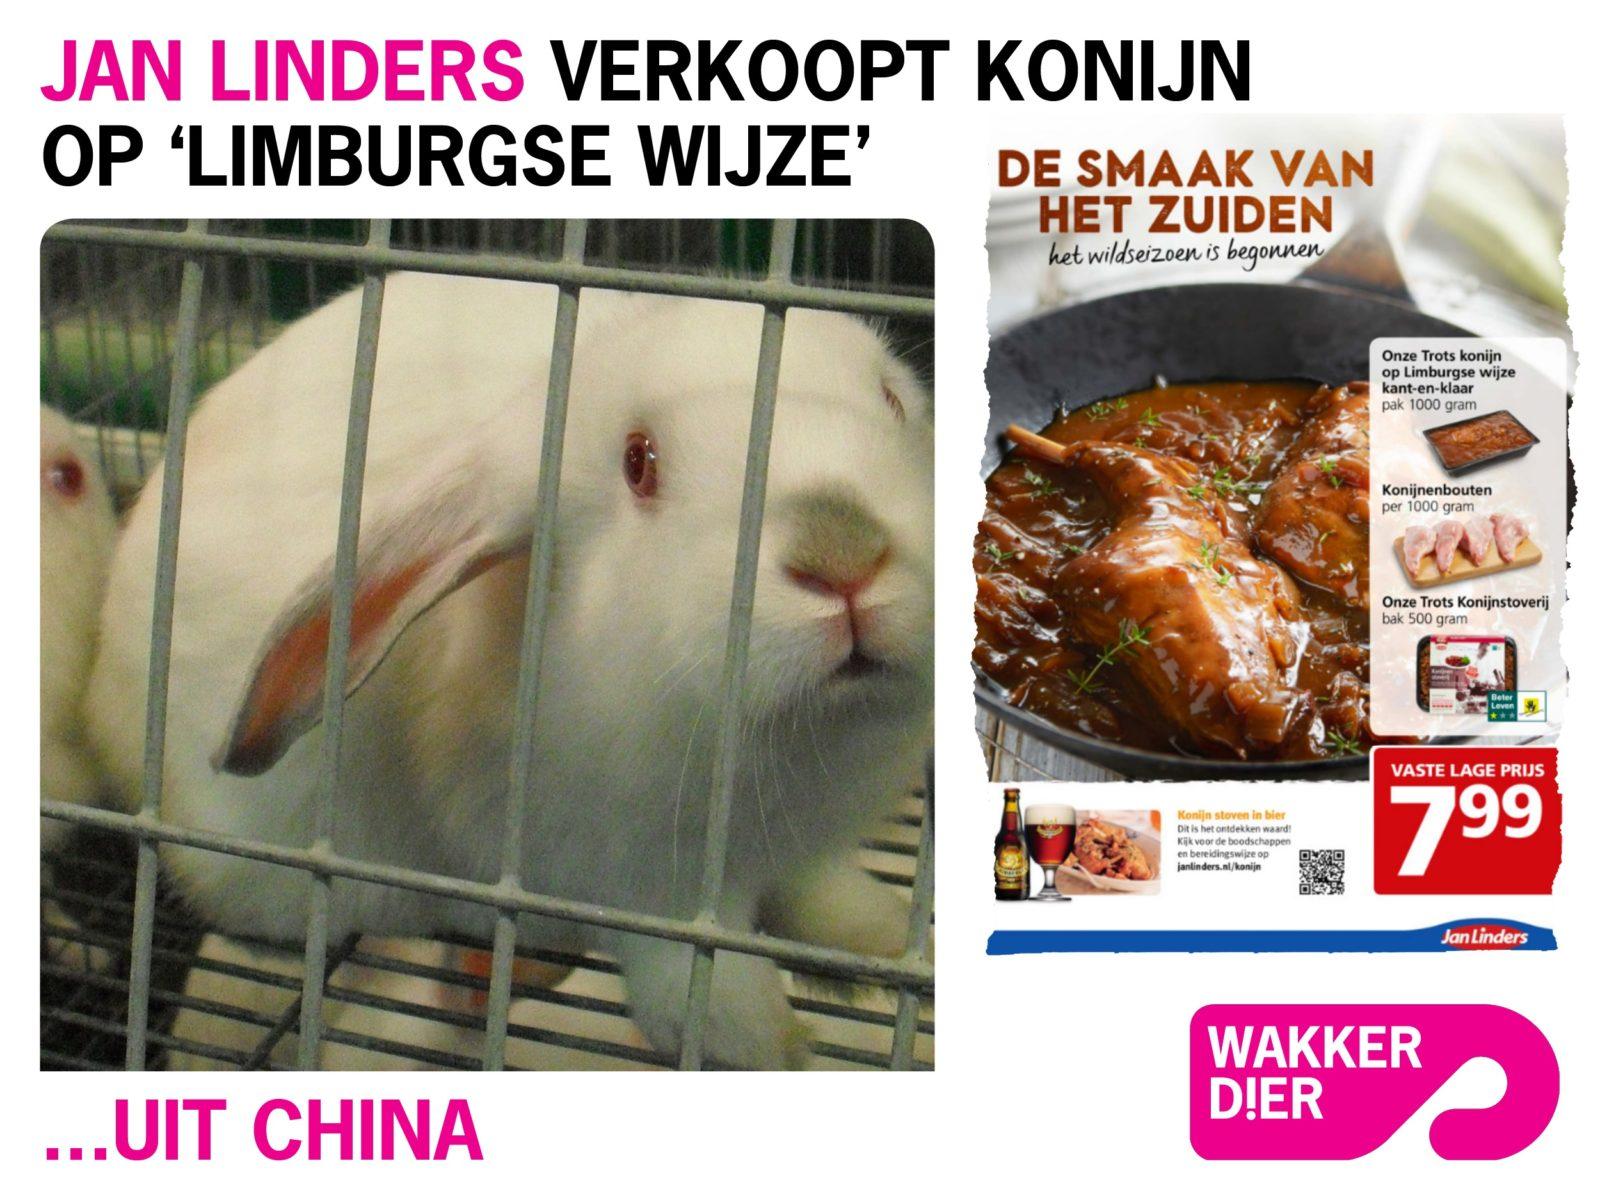 Jan Linders konijn uit china